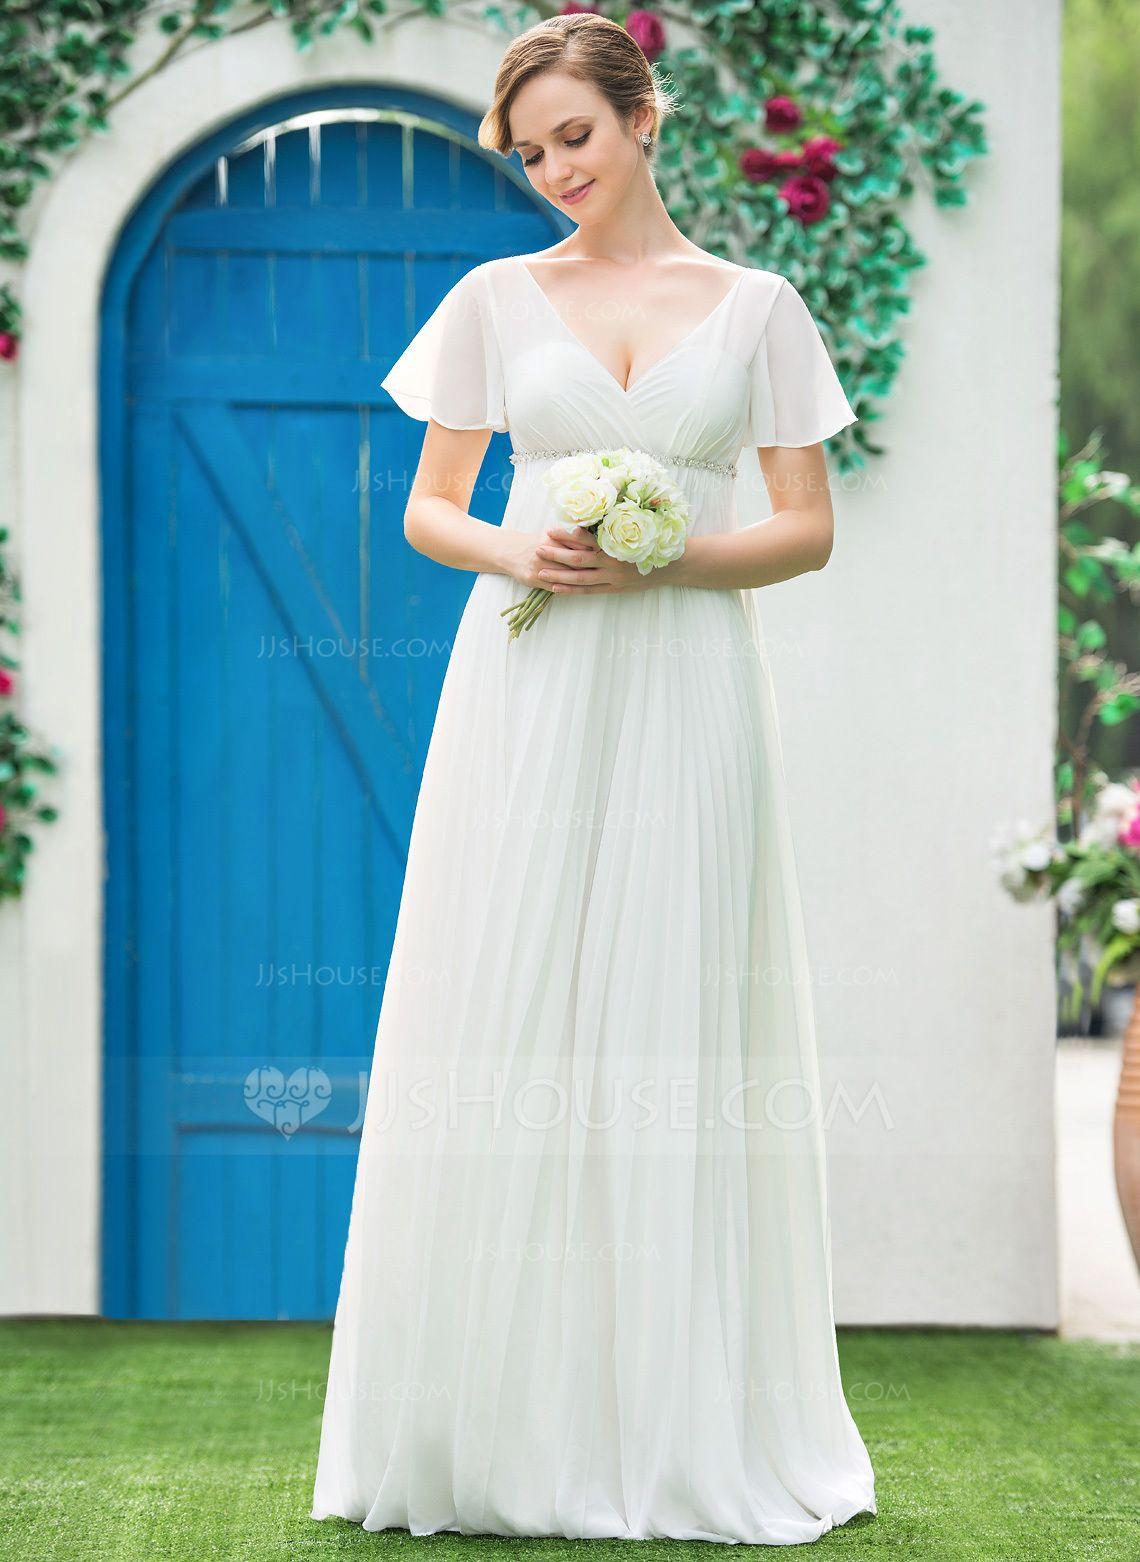 Us 154 00 Empire V Neck Floor Length Chiffon Wedding Dress With Beading Pleated Jj S House Empire Wedding Dress Wedding Dresses Chiffon Wedding Dress [ 1562 x 1140 Pixel ]